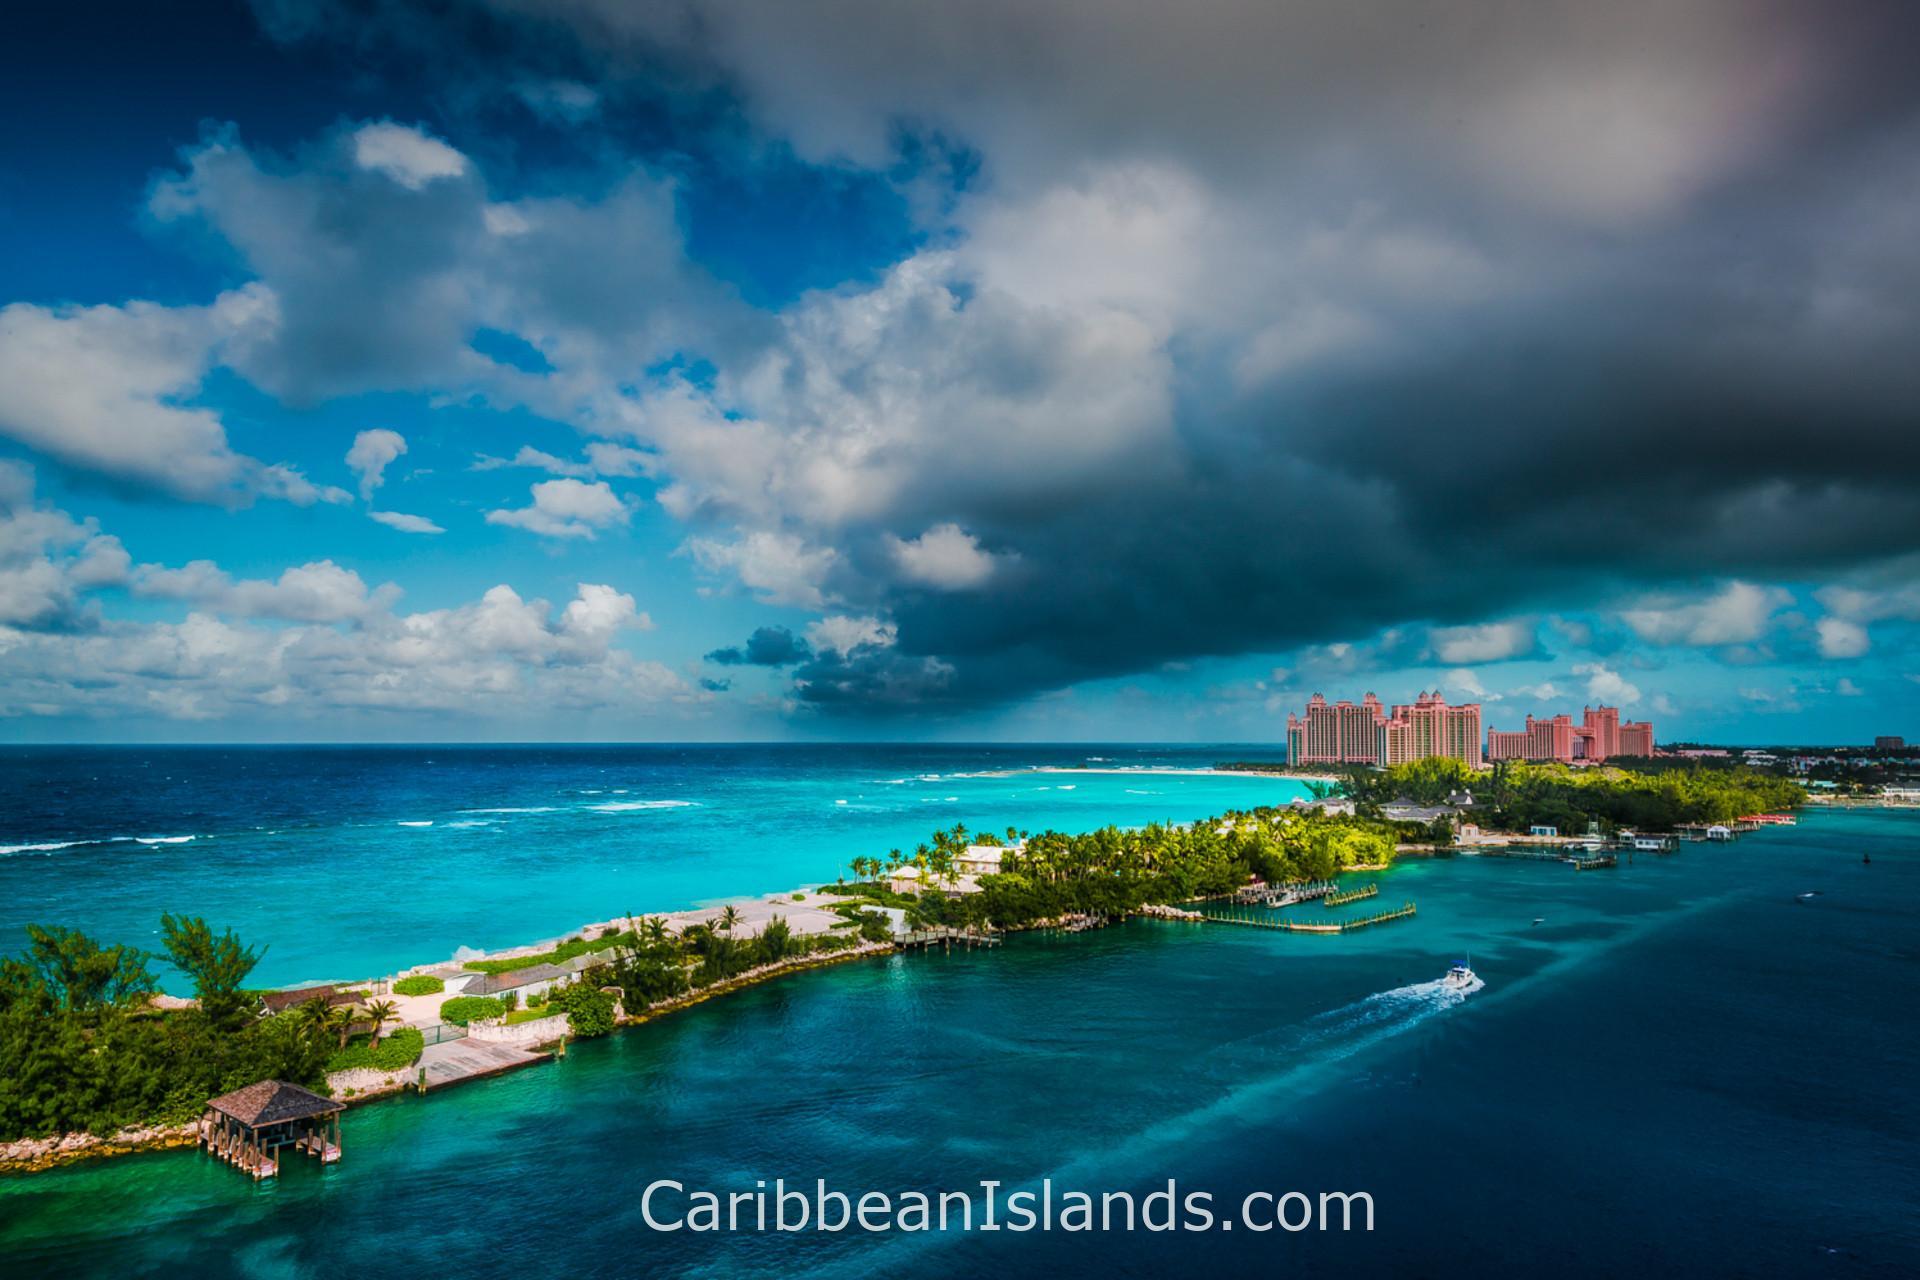 The Bahamas islands, Caribbean